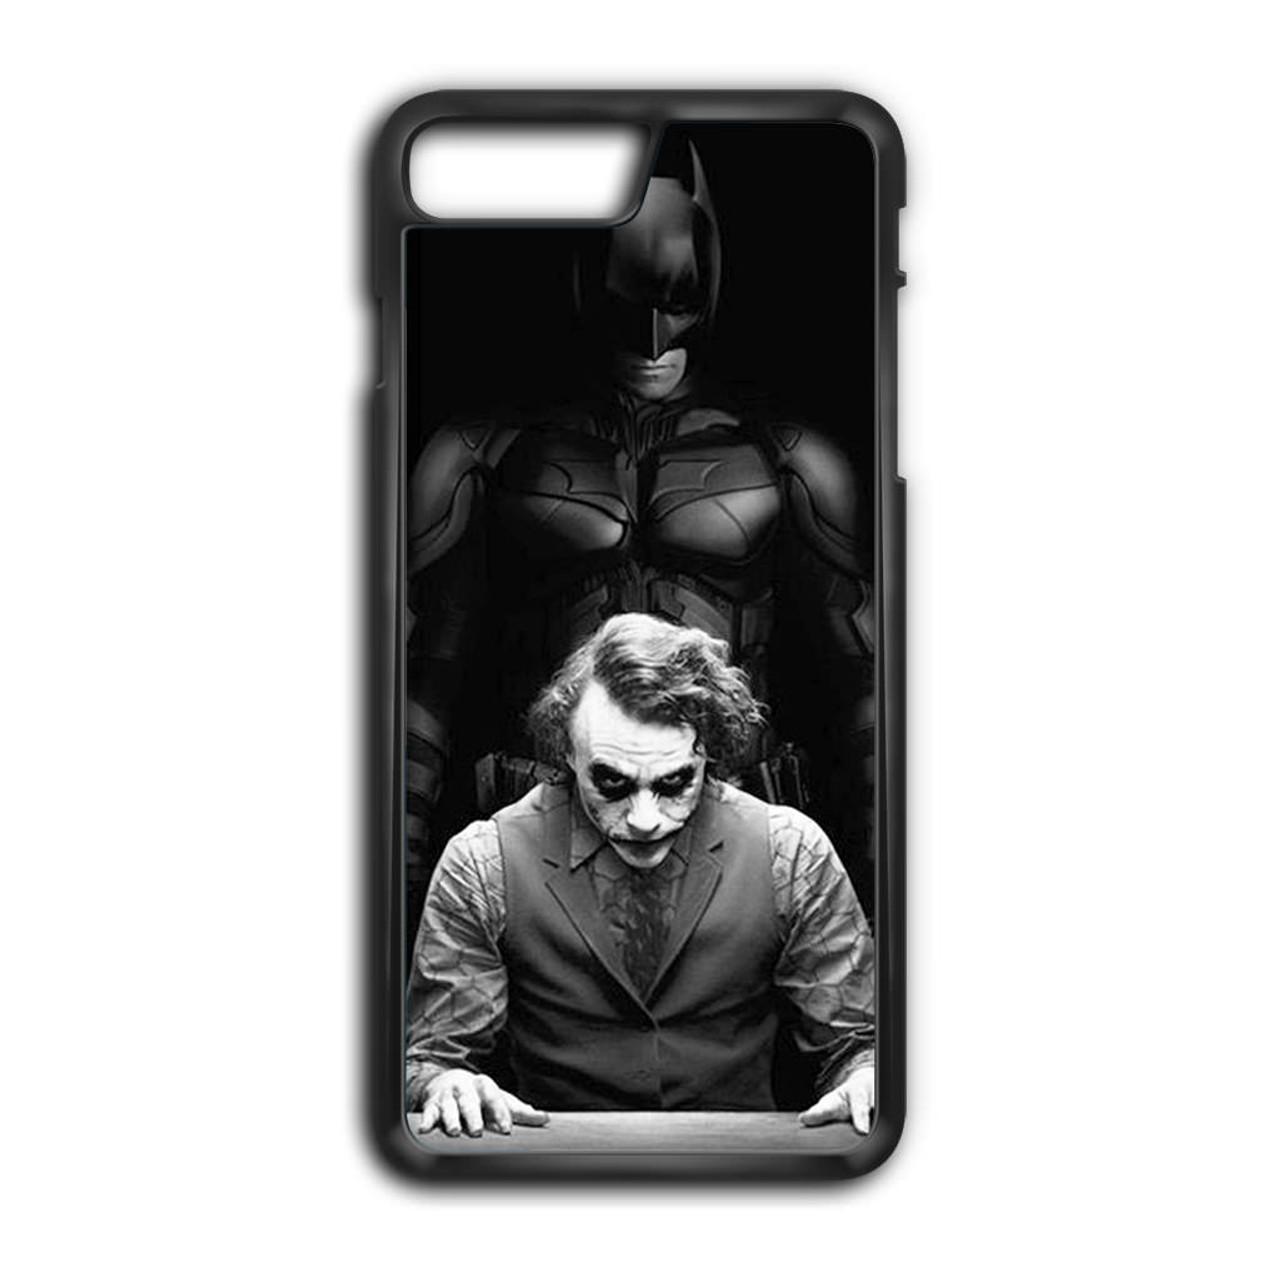 new product 5cafb e80e1 Batman and Joker iPhone 7 Plus Case